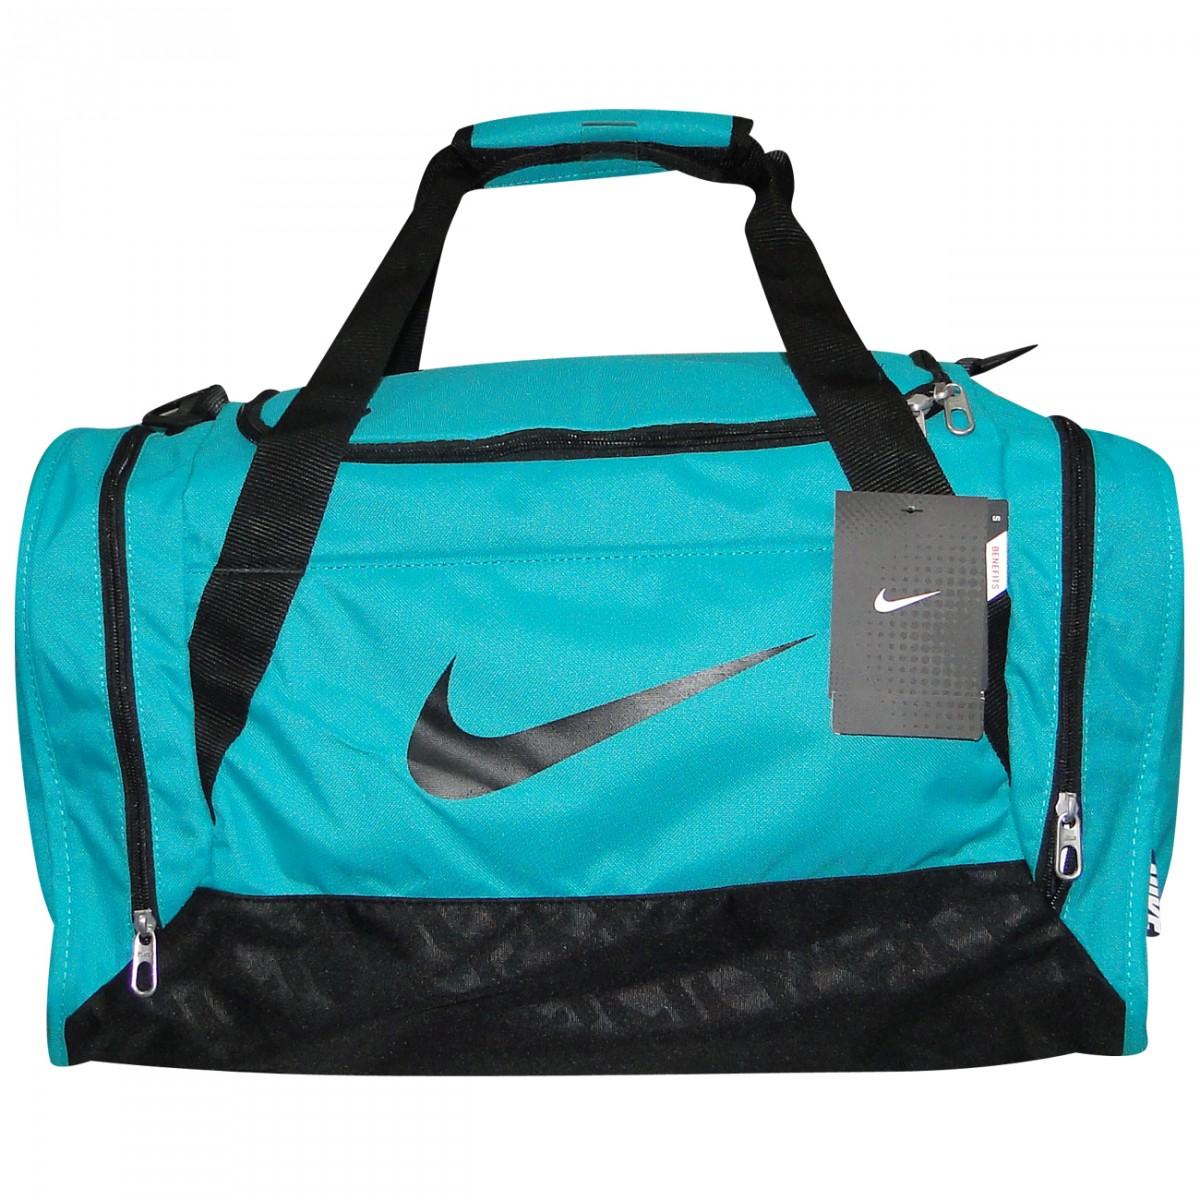 Bolsa De Mao Nike   Bolsa nike ba verde preto chuteira 11852b5e2481a